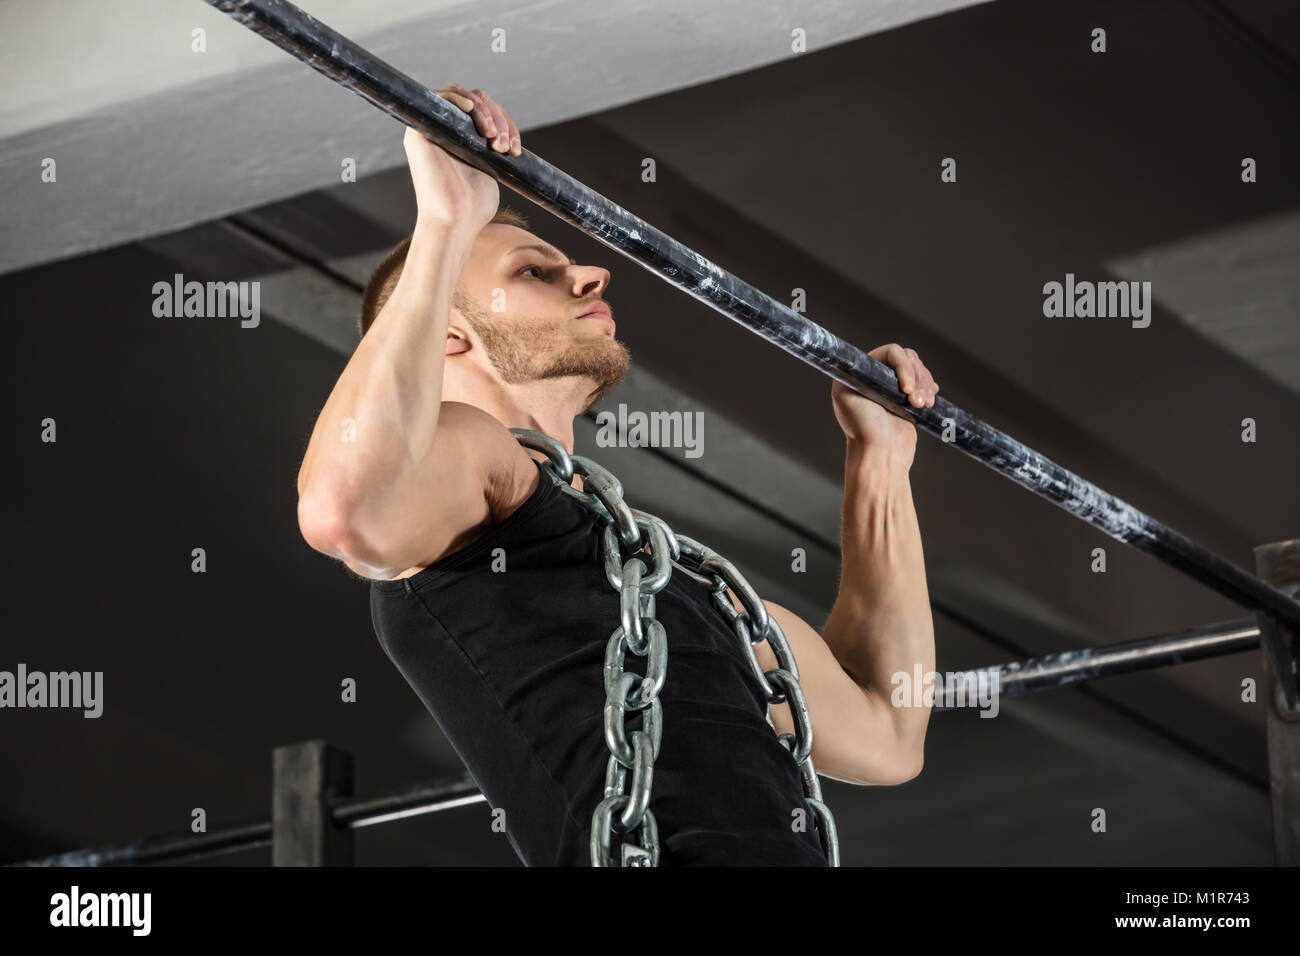 athlete man wearing a metal chain doing pull ups on horizontal bar